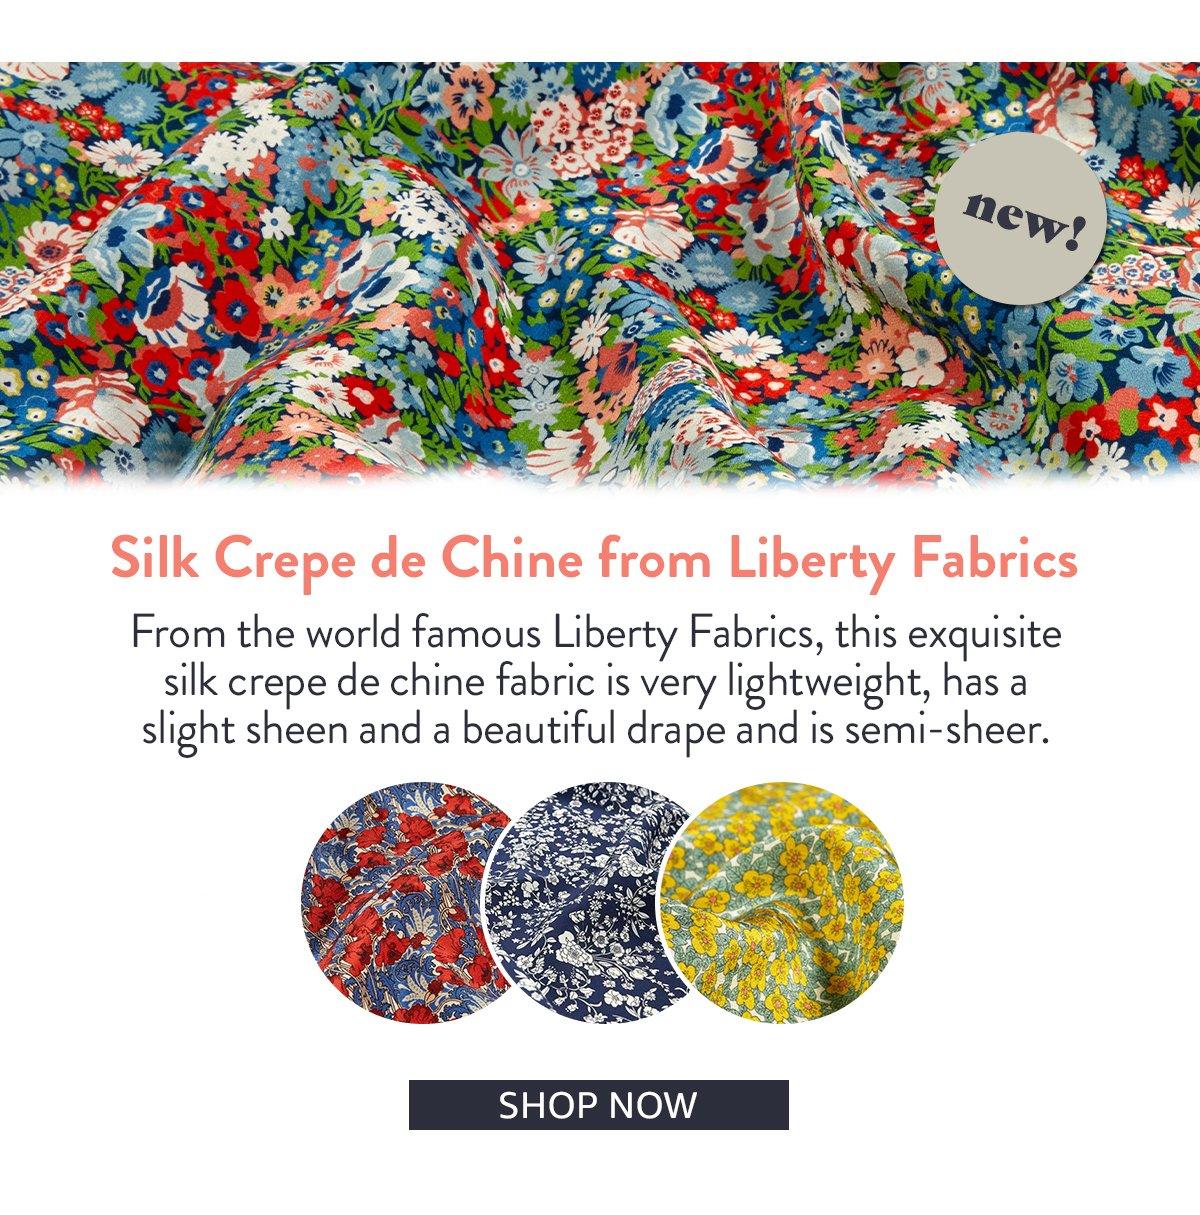 Silk Crepe de Chine from Liberty Fabrics   SHOP NOW